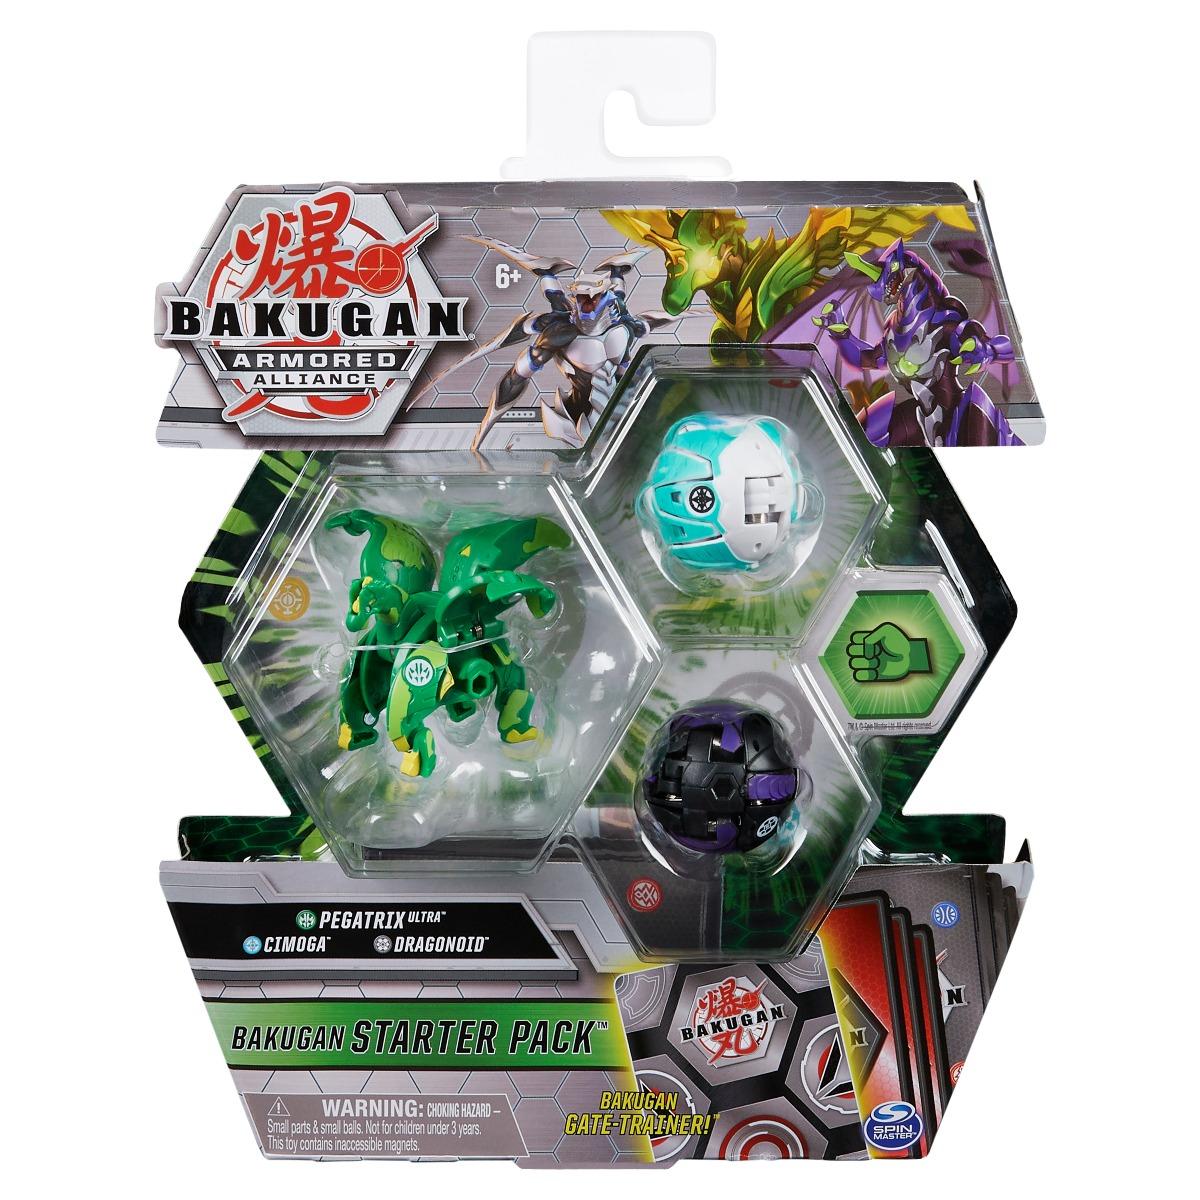 Set Bakugan Armored Alliance, Pegatrix Ultra, Cimoga, Dragonoid 20124817